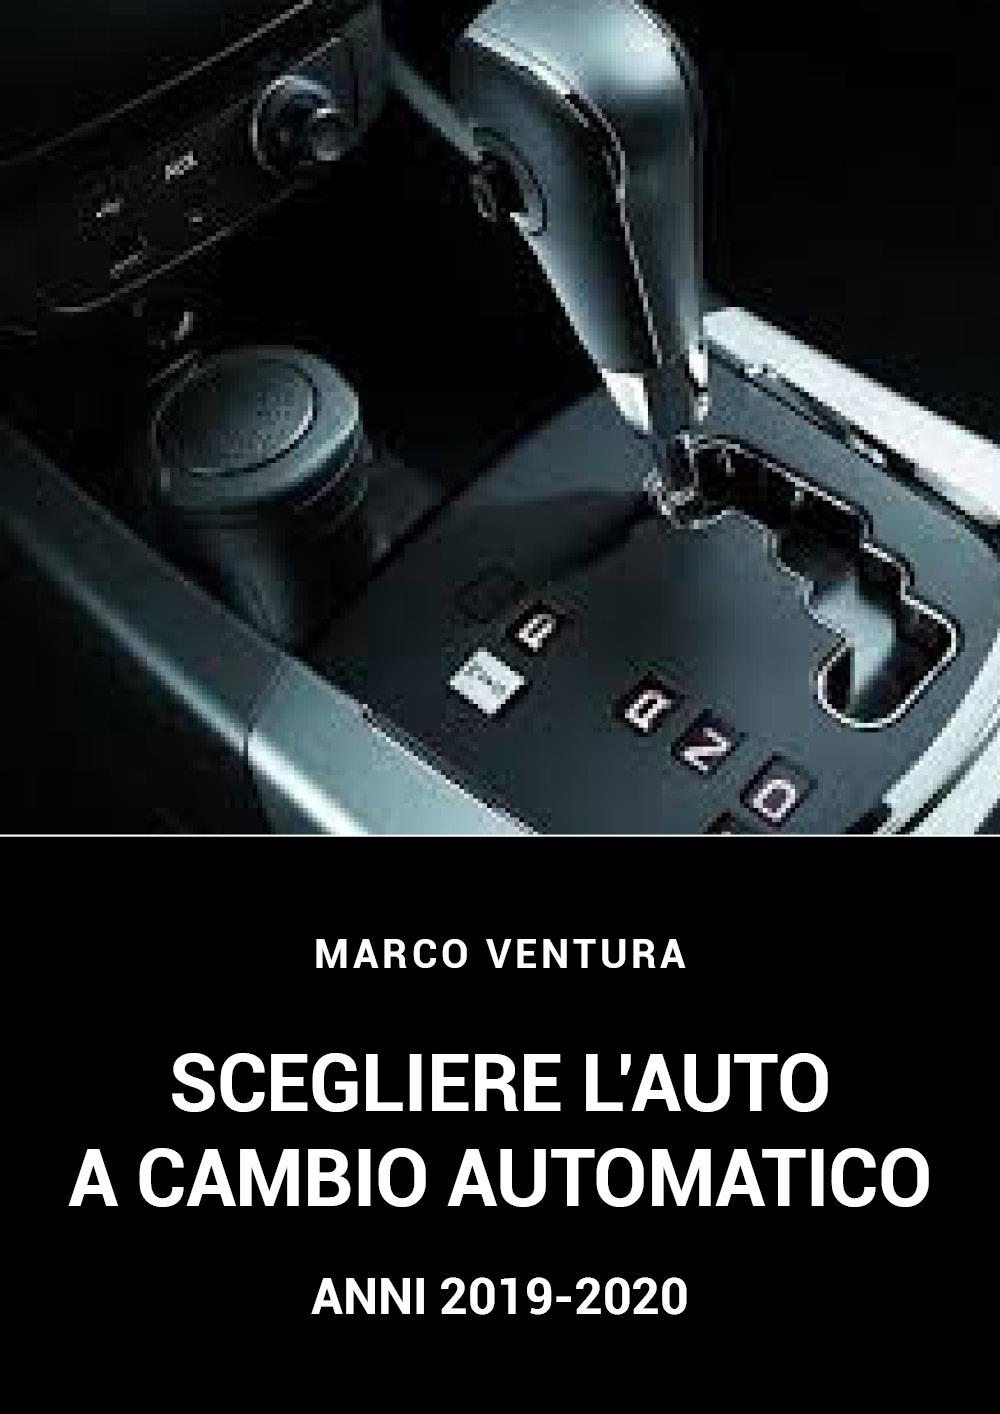 Le auto a cambio automatico-anni 2019-2020/ automatic transmission cars years 2019- 2020